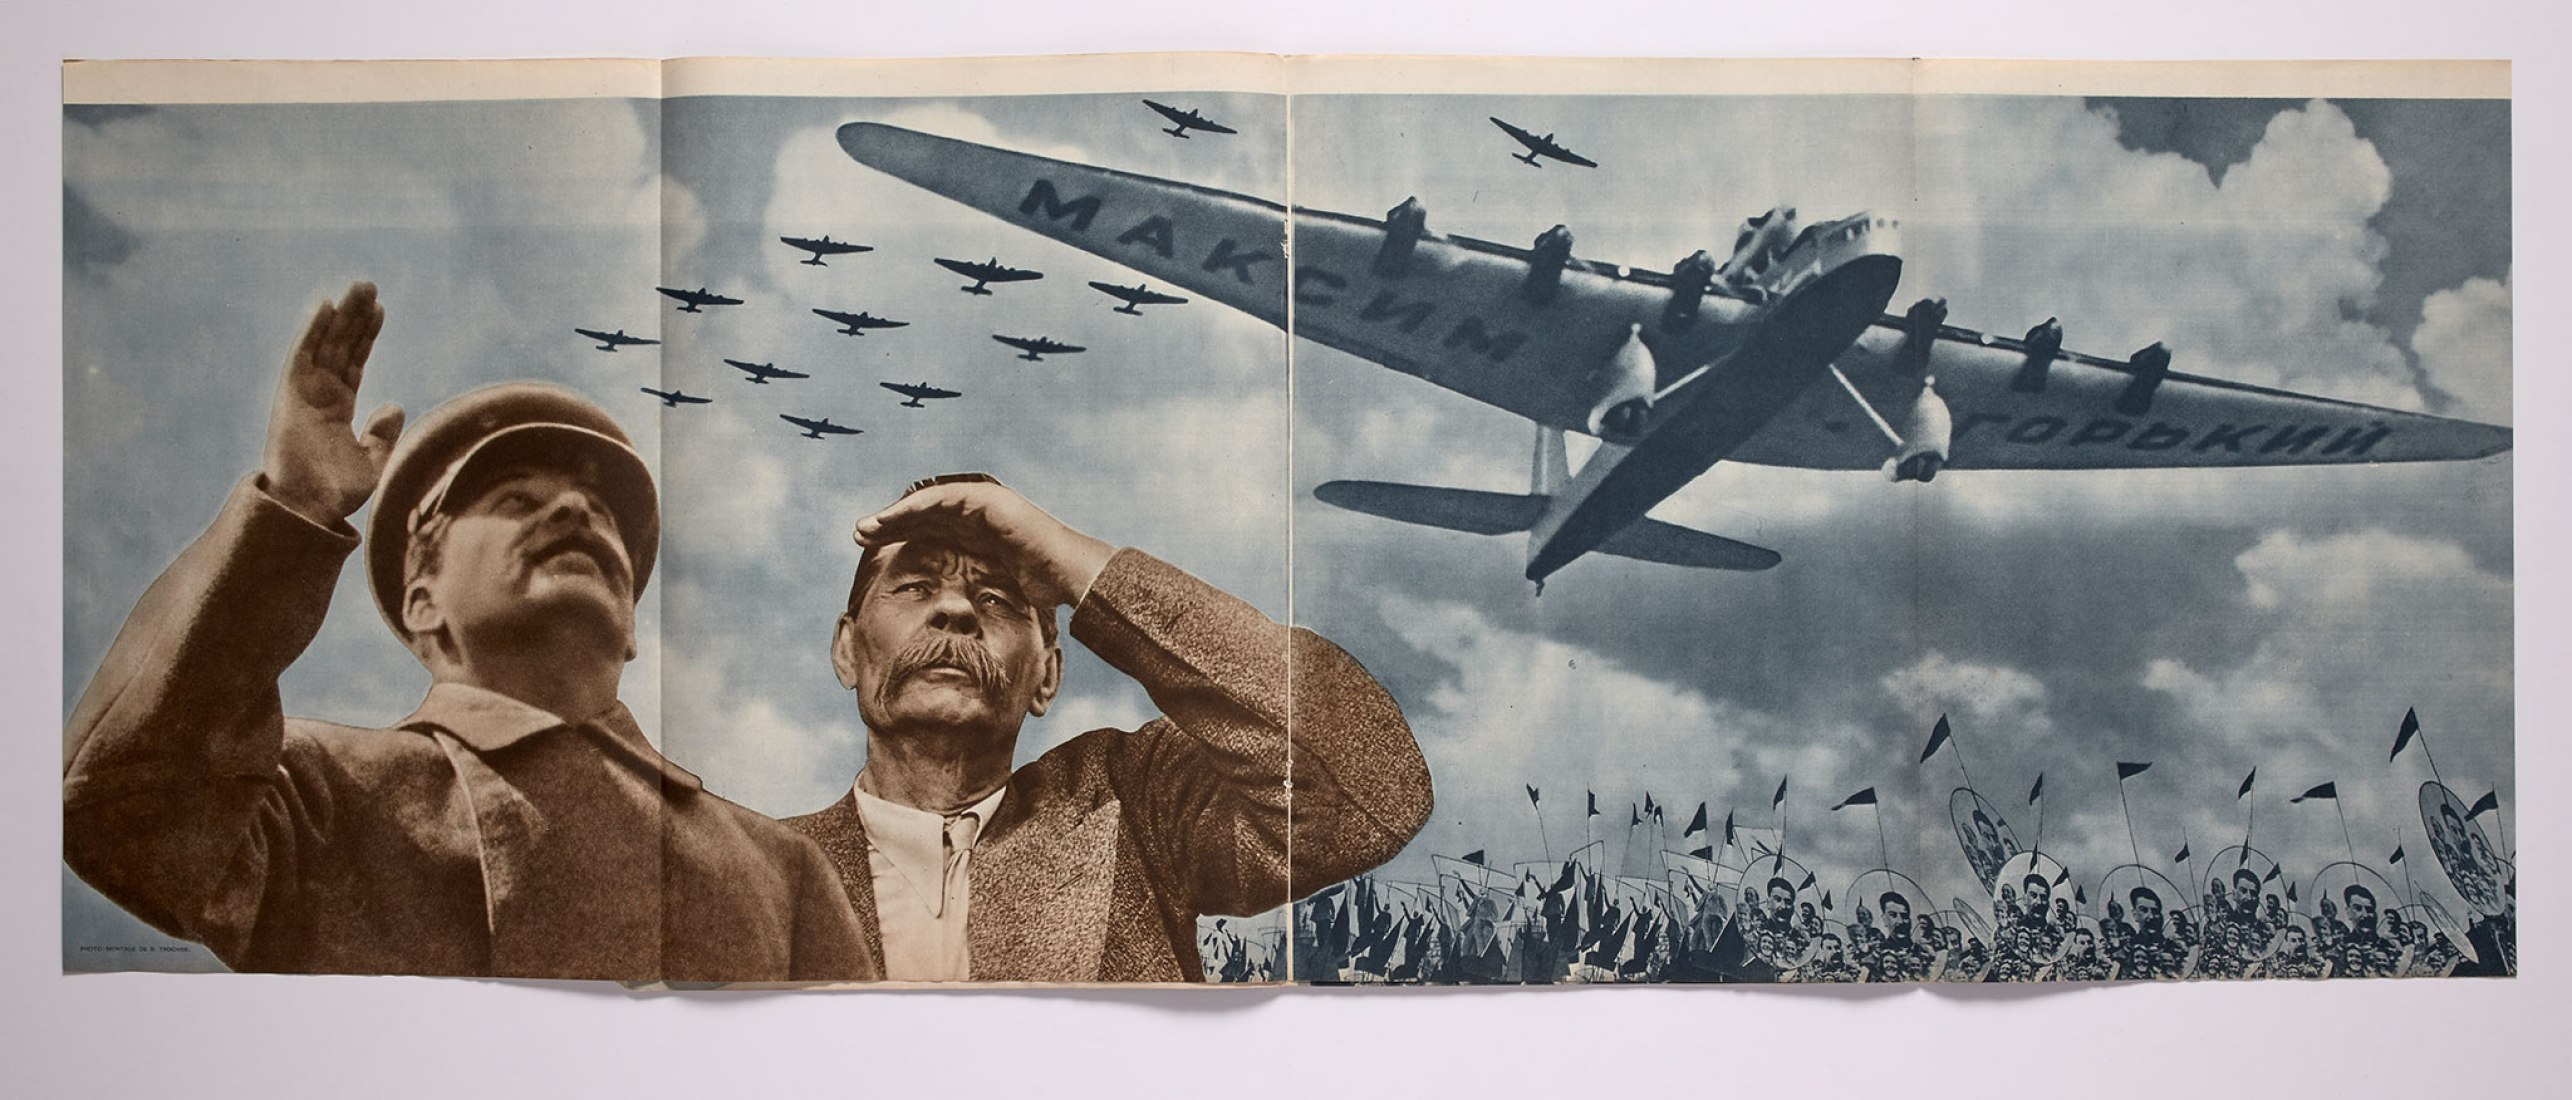 Nikolai Troshin: The USSR under construction, No. 1, January 1935. Interior pages